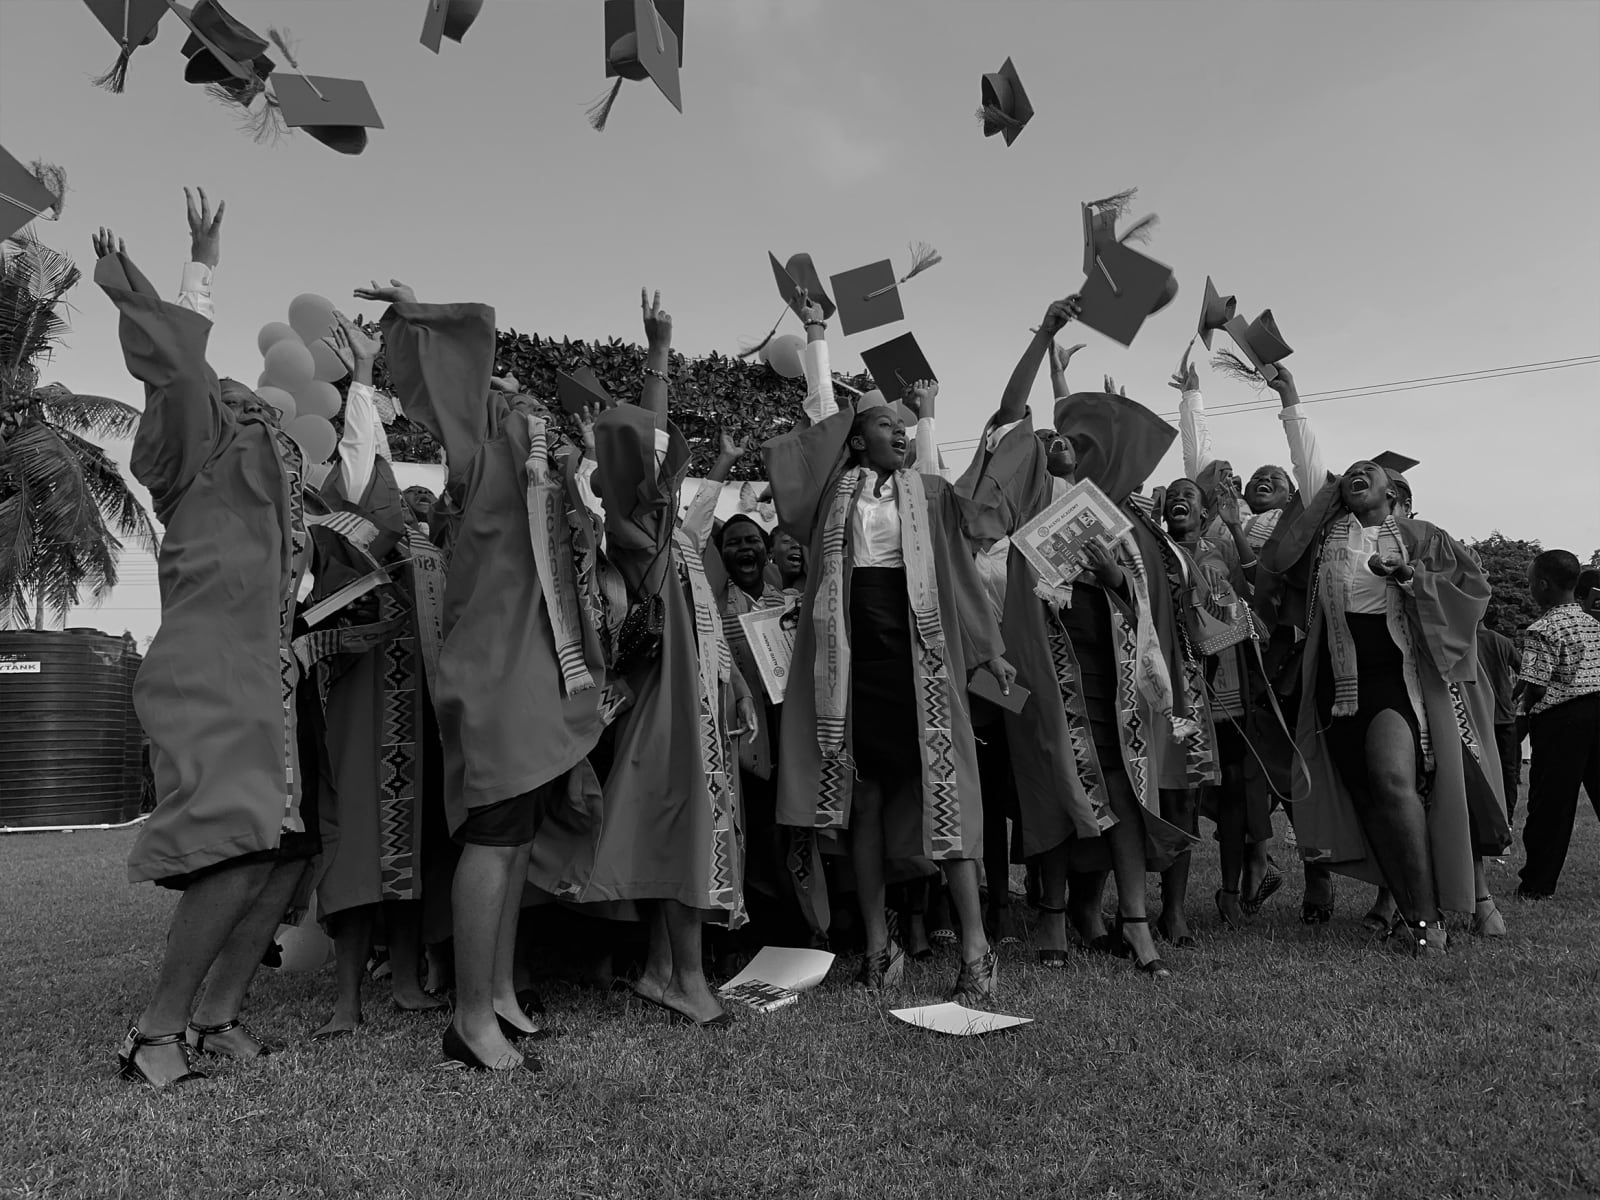 Yasmine Iddriss Graduation 28.08 x 21 cm 19.74 x 14.8 cm Digital print